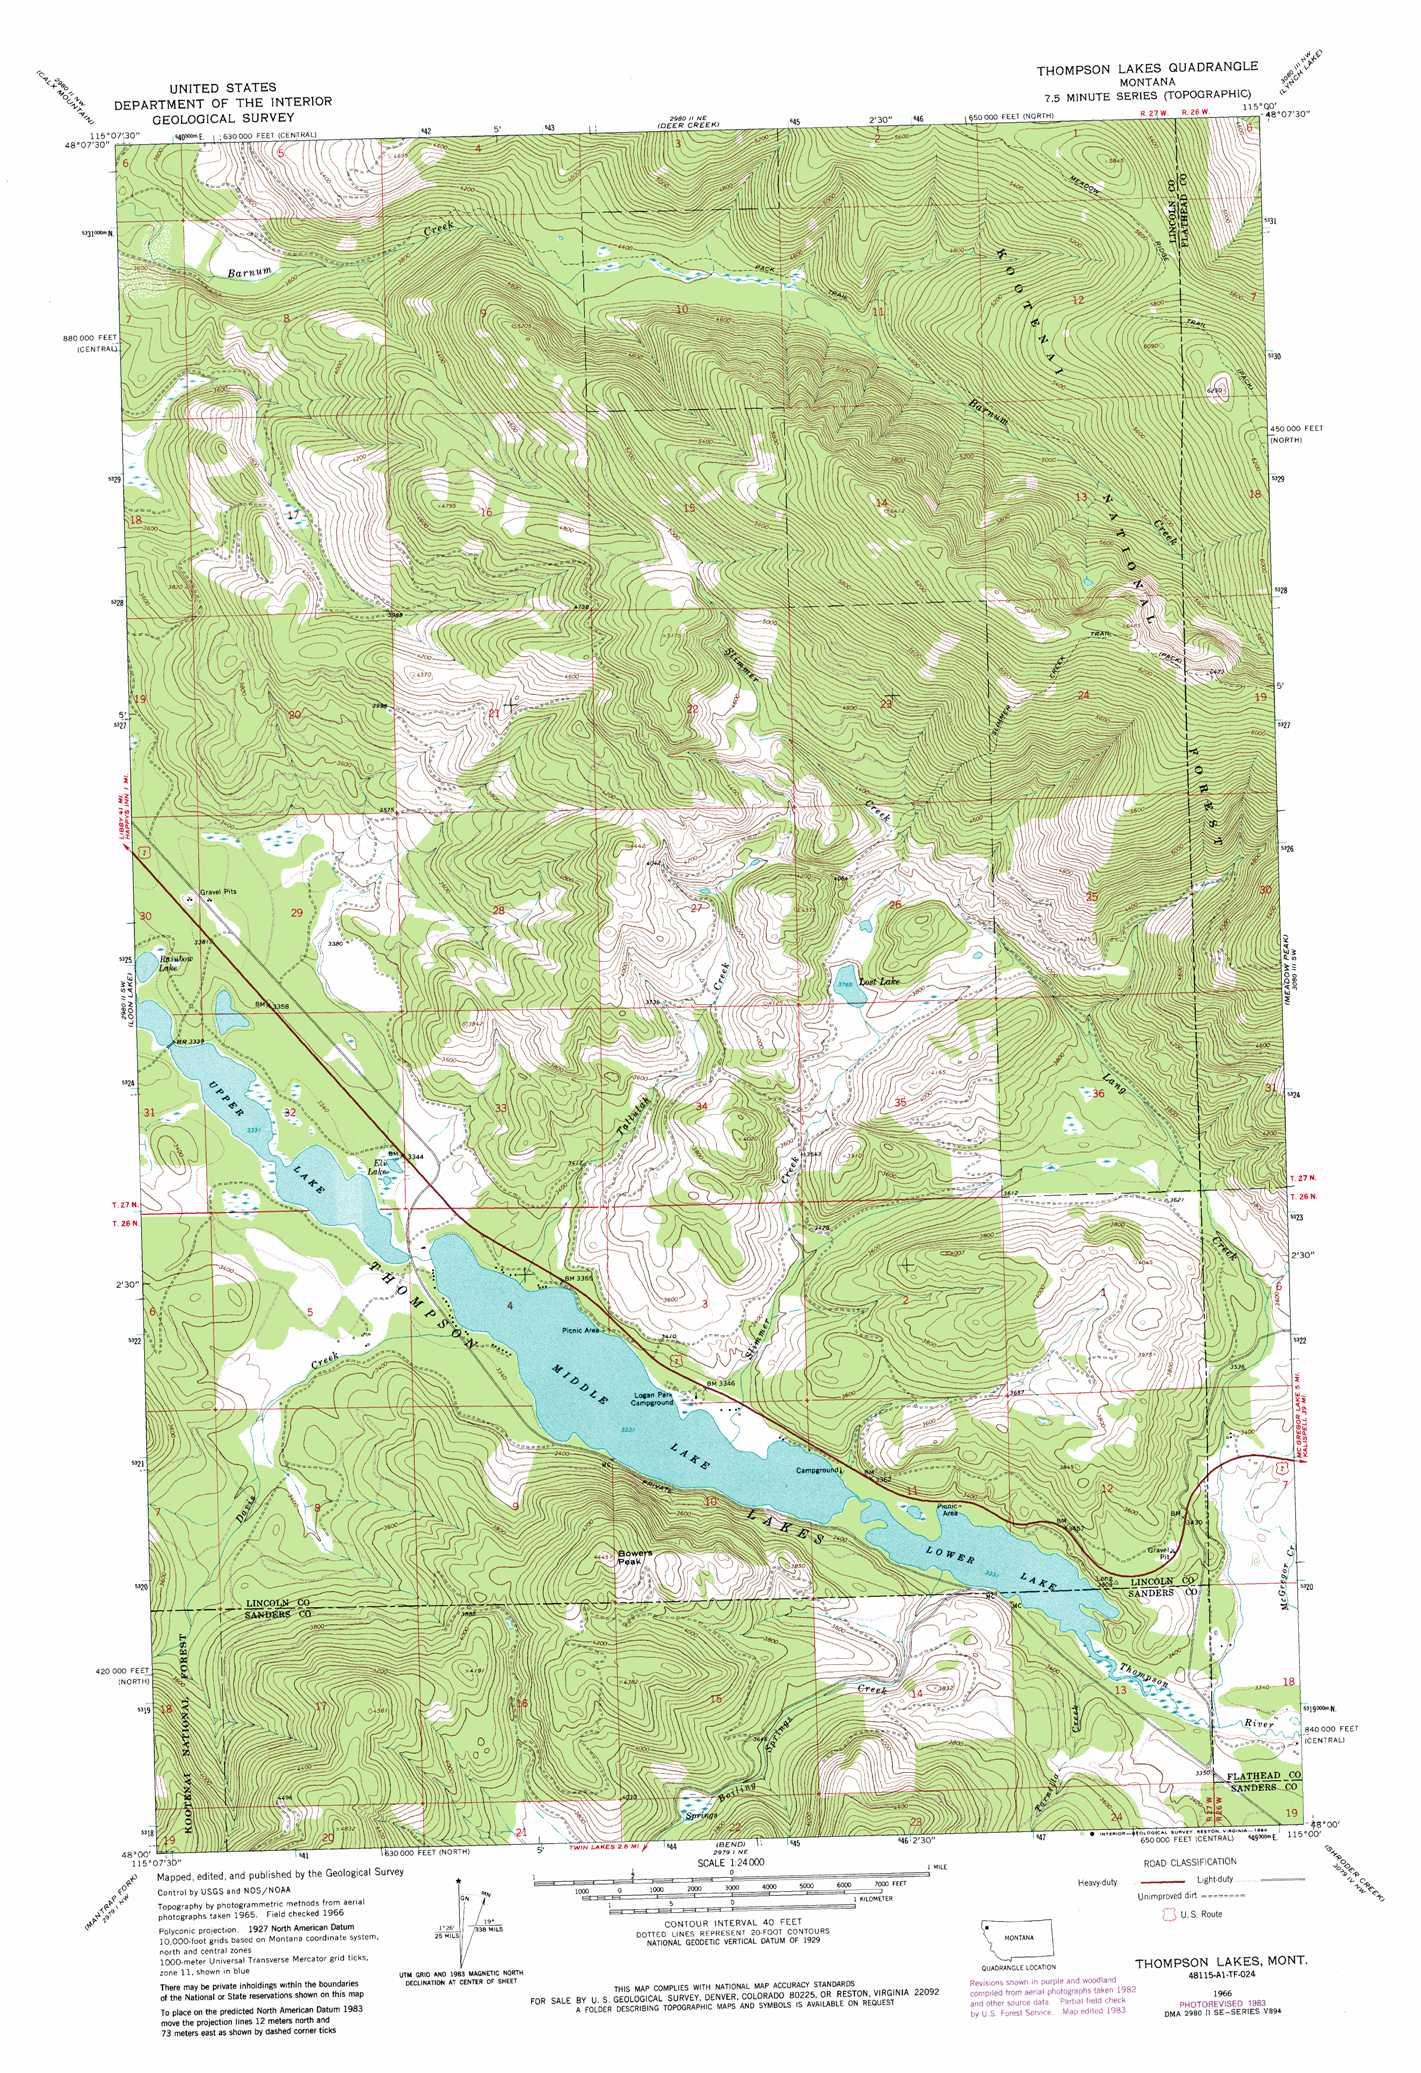 Thompson Lakes topographic map, MT - USGS Topo Quad 48115a1